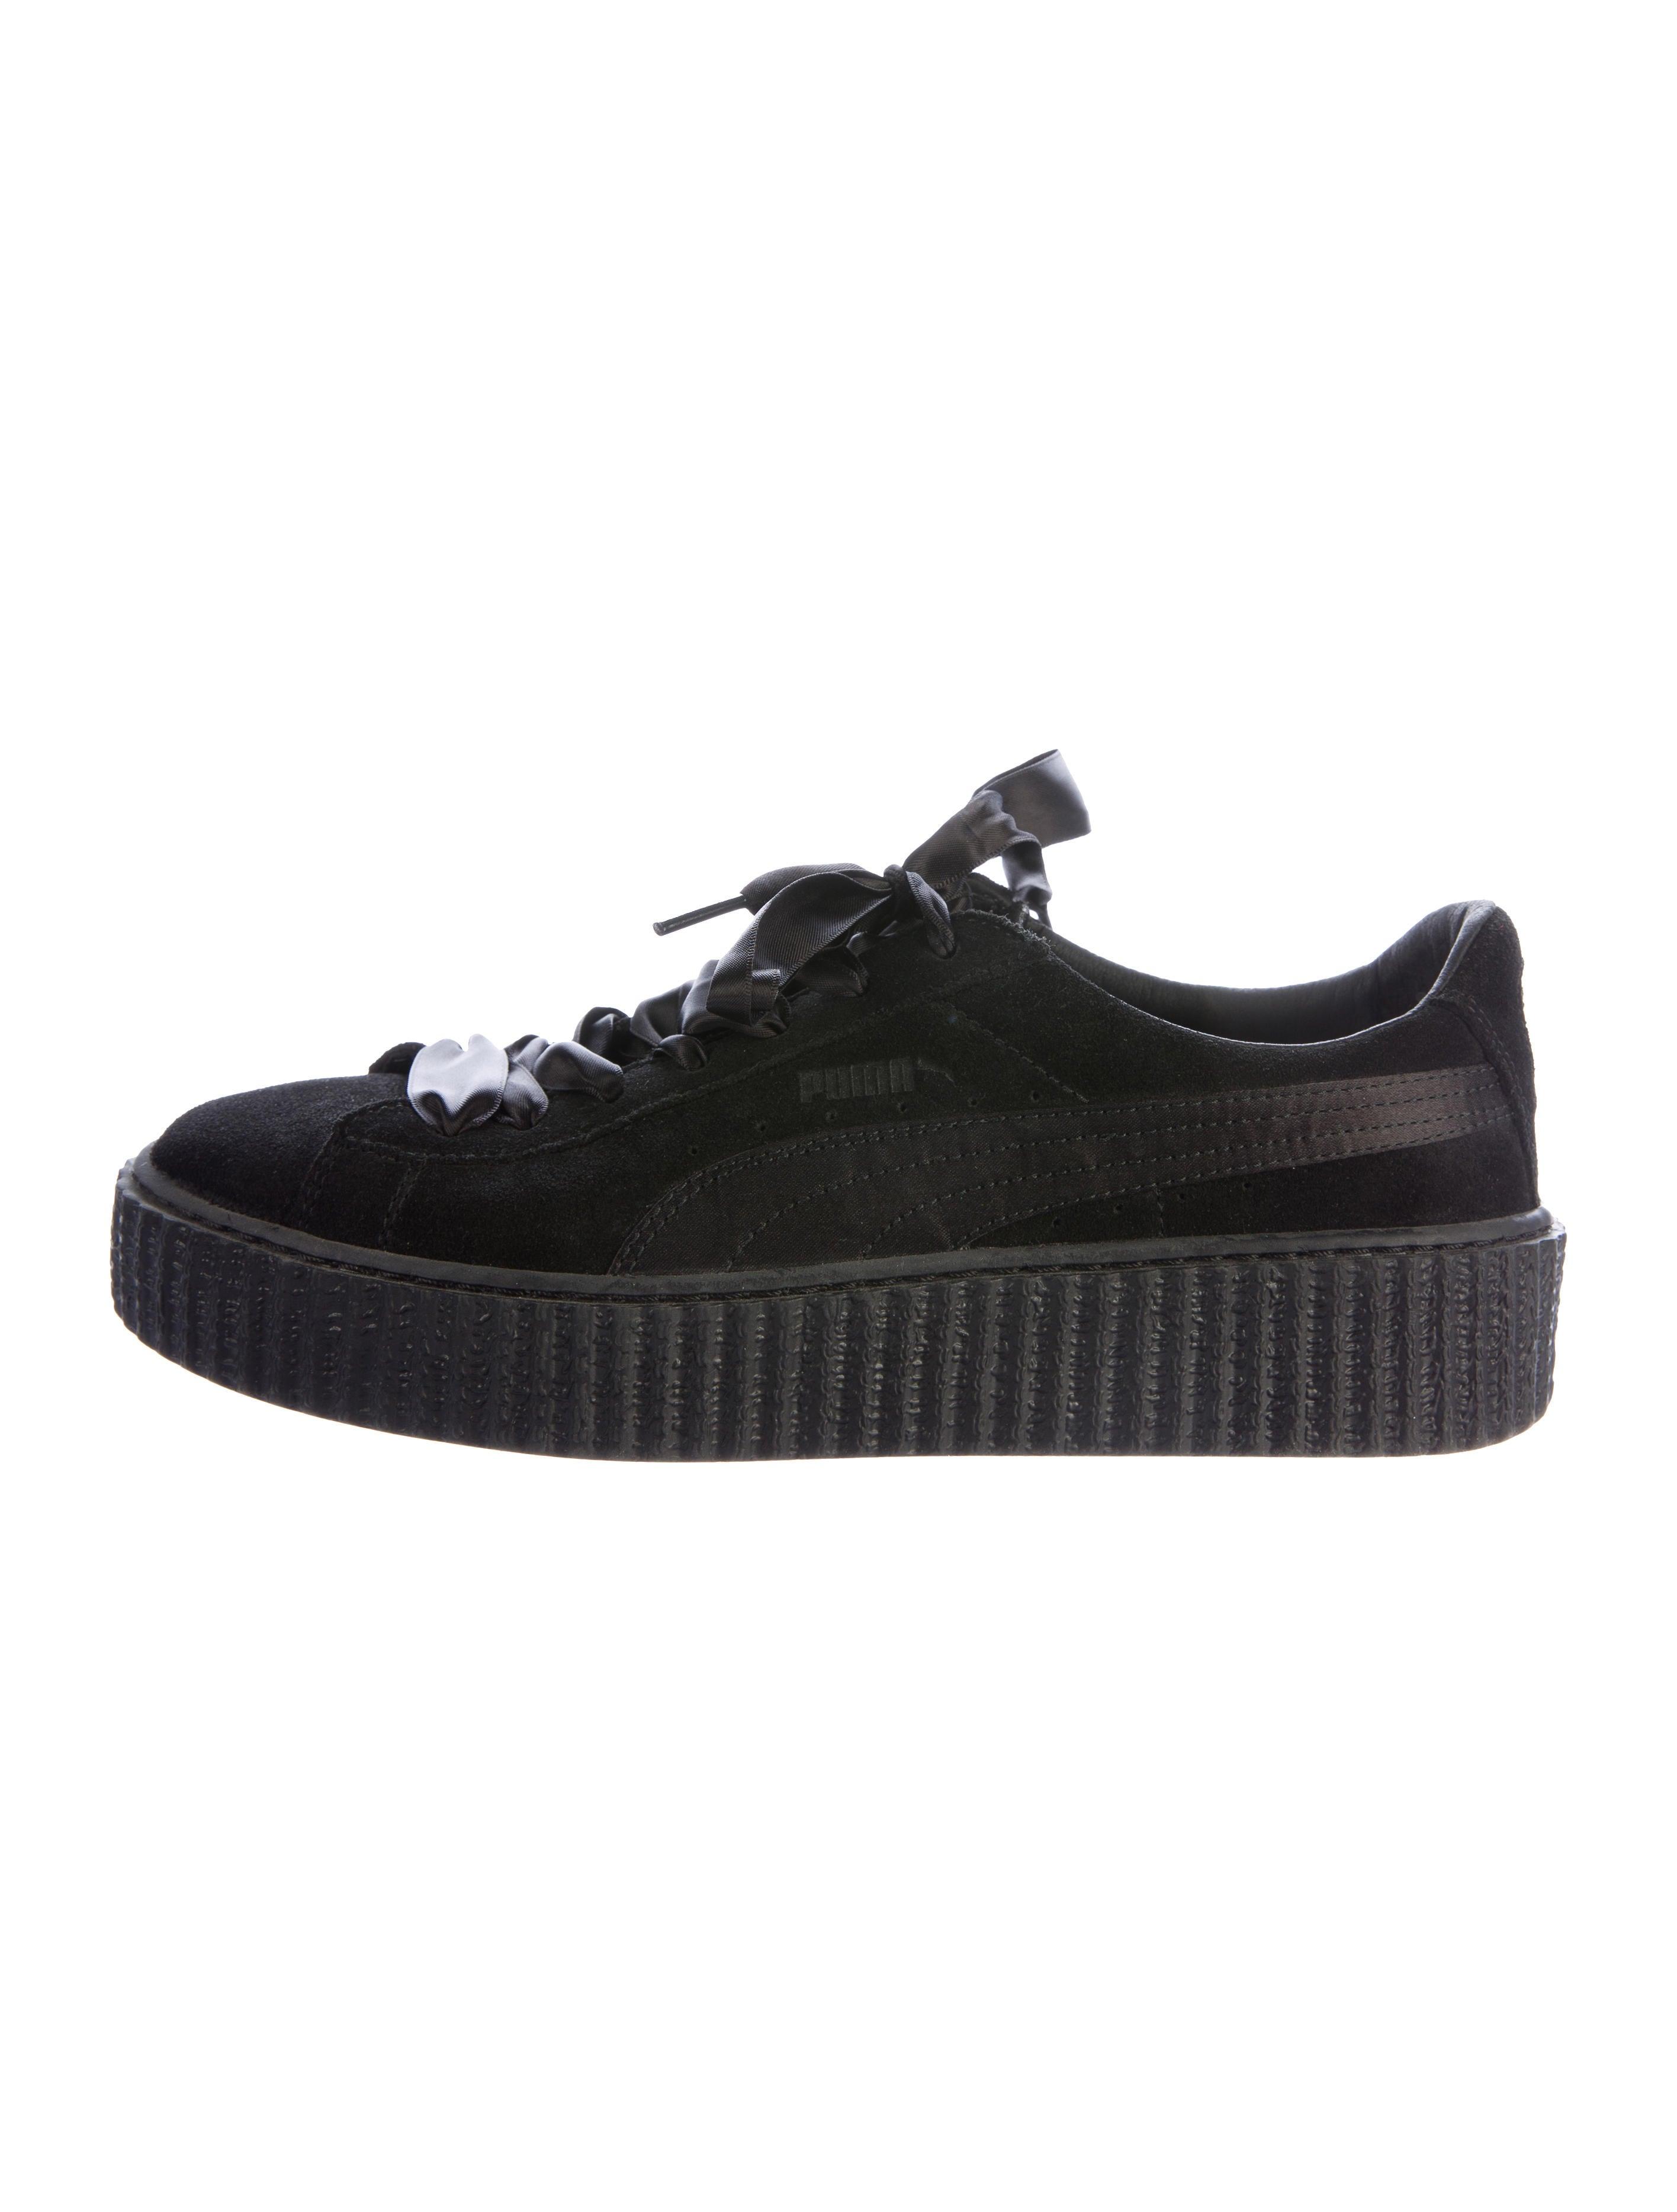 puma x fenty suede platform creepers shoes wpmfy20184. Black Bedroom Furniture Sets. Home Design Ideas